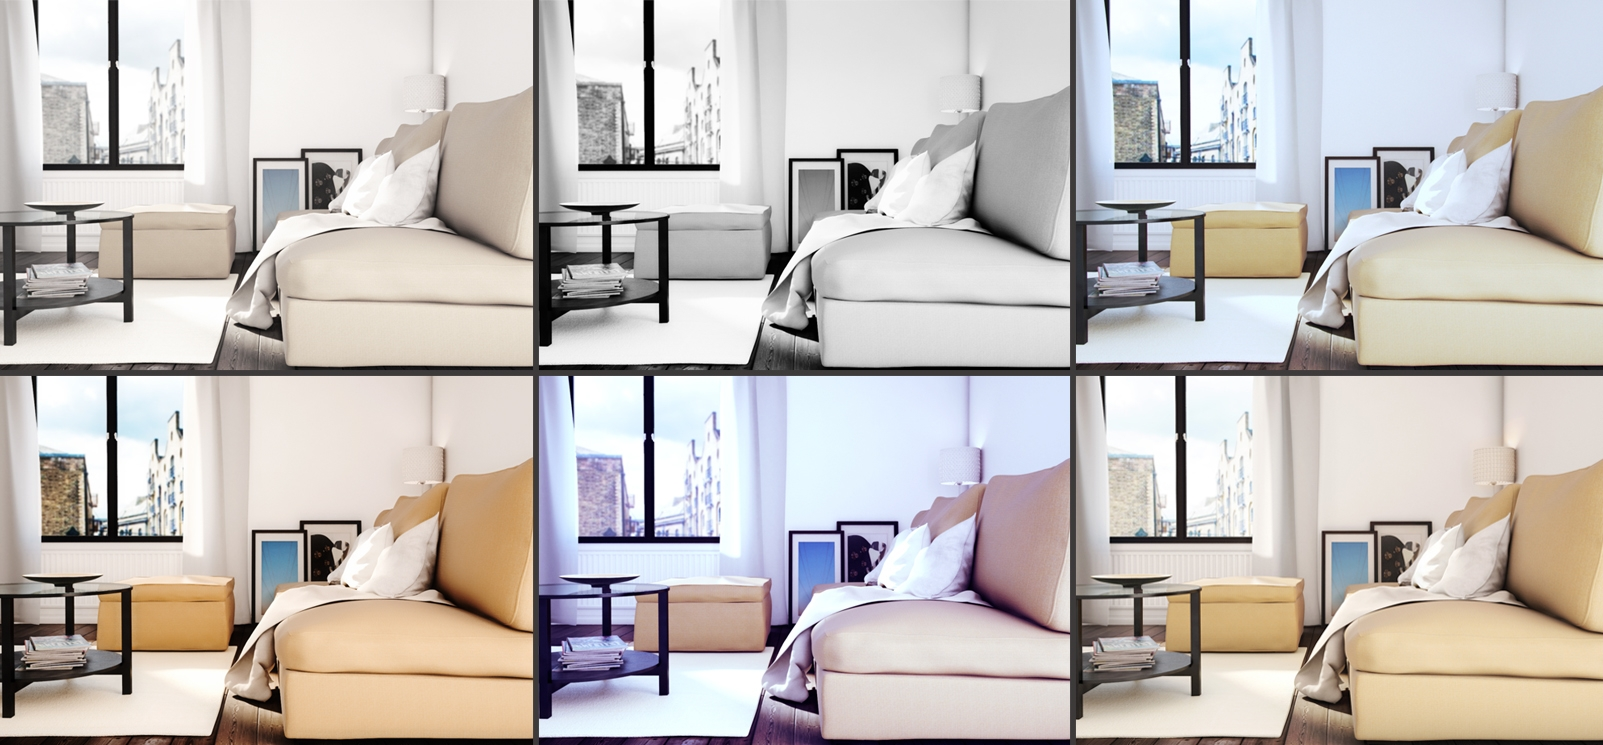 IKEA style interior - colour op - coop567 | ello